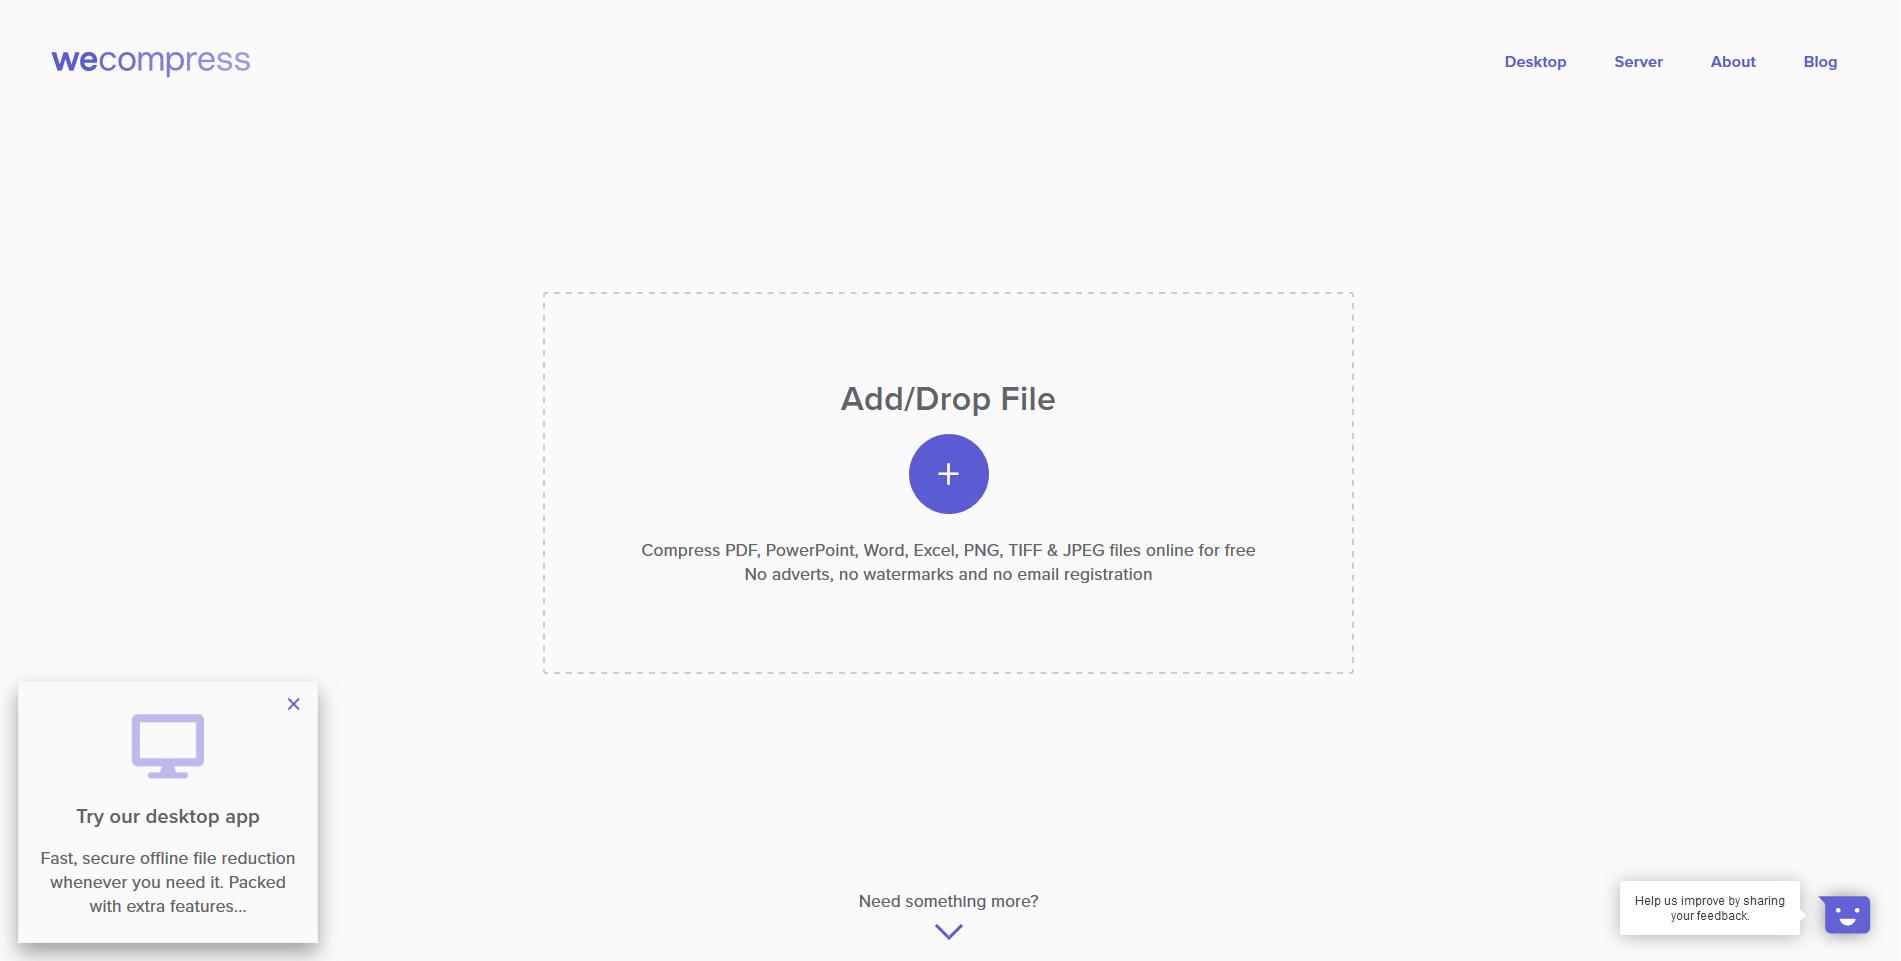 How to Build a Better B2B Web UI - DZone Web Dev